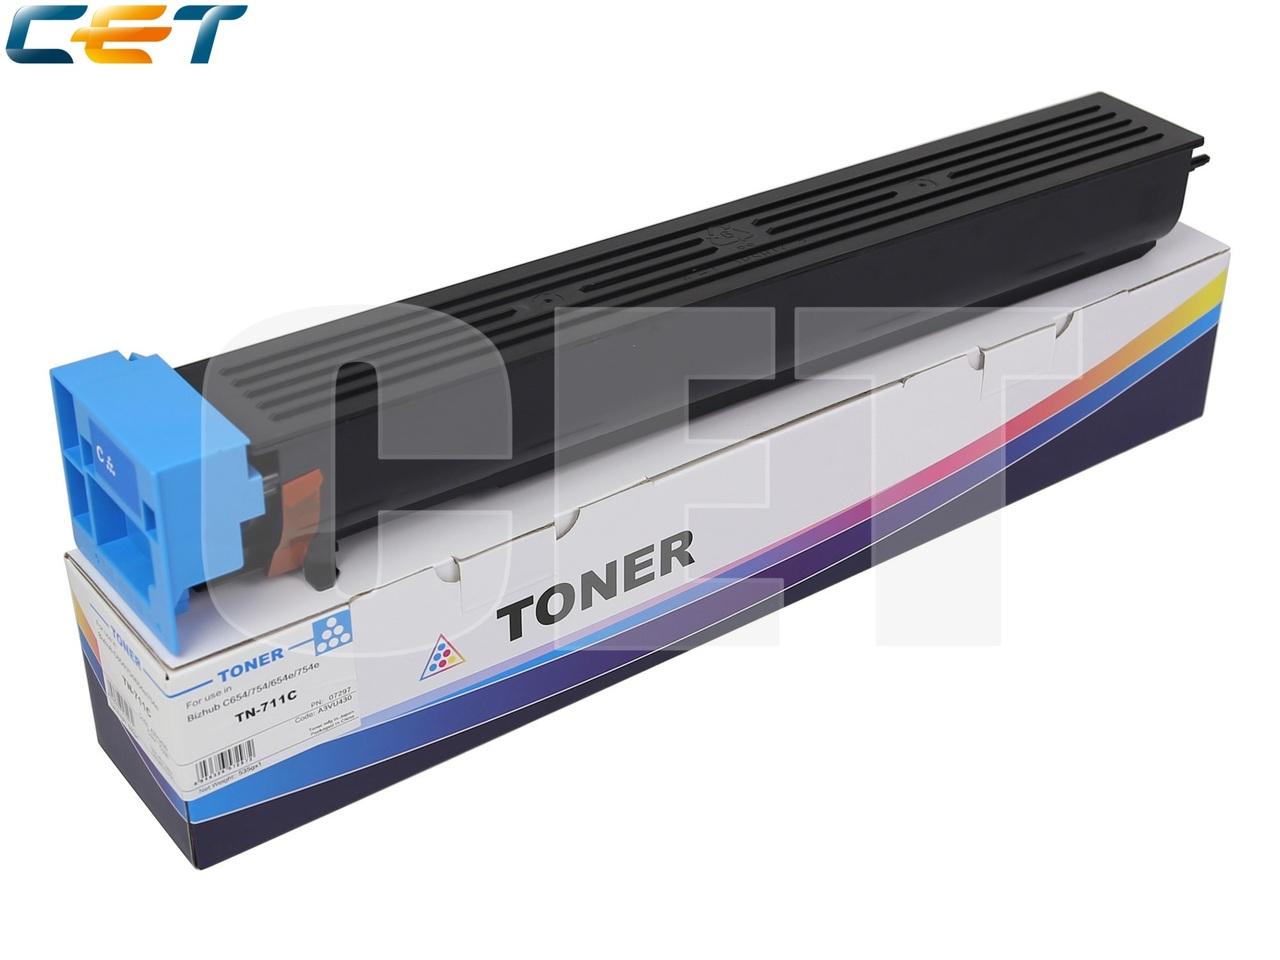 Тонер-картридж TN-711C для KONICA MINOLTA BizhubC454/C554/C454e/C554e (CET) Cyan, 535г, 31500 стр.,CET7297